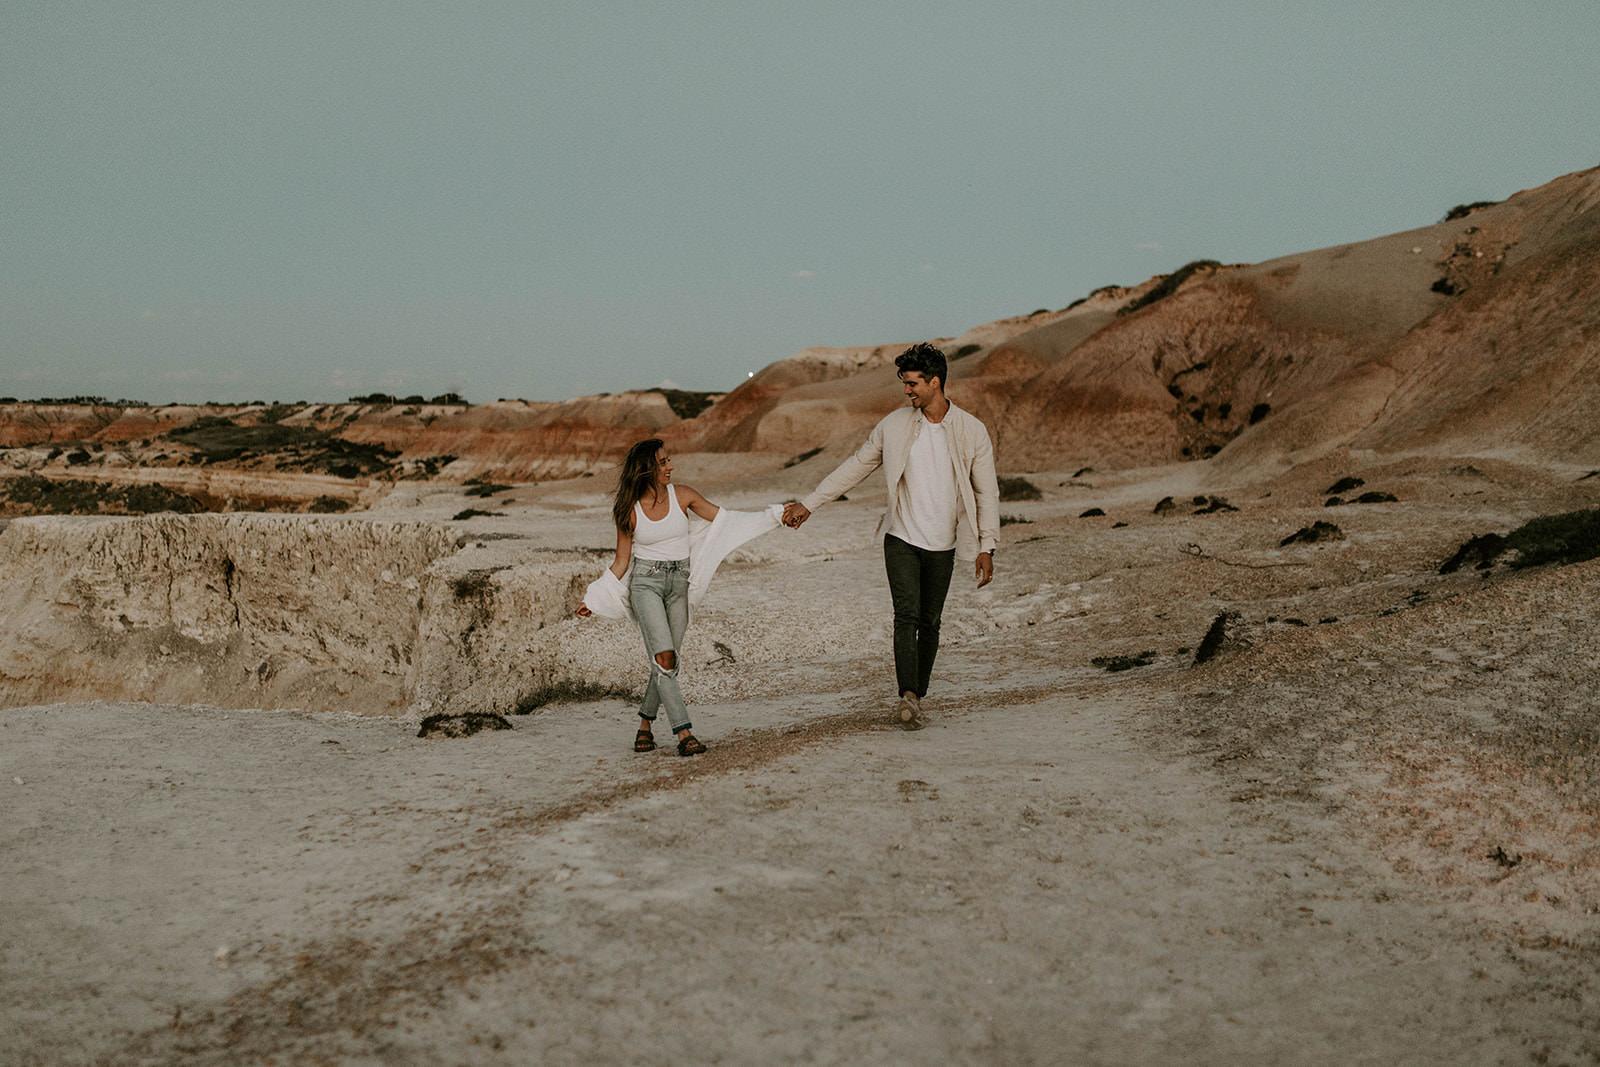 Let's Escape to Mars by Hayley Rafton